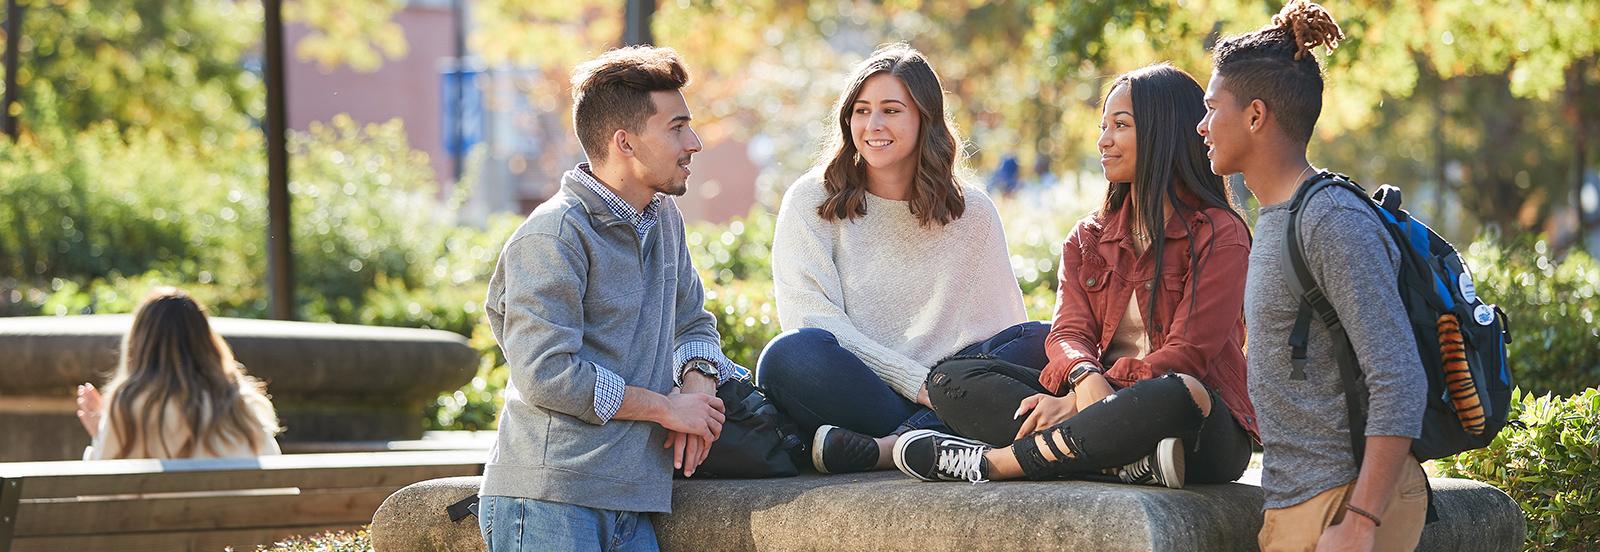 Explore the Interdisciplinary Studies programs